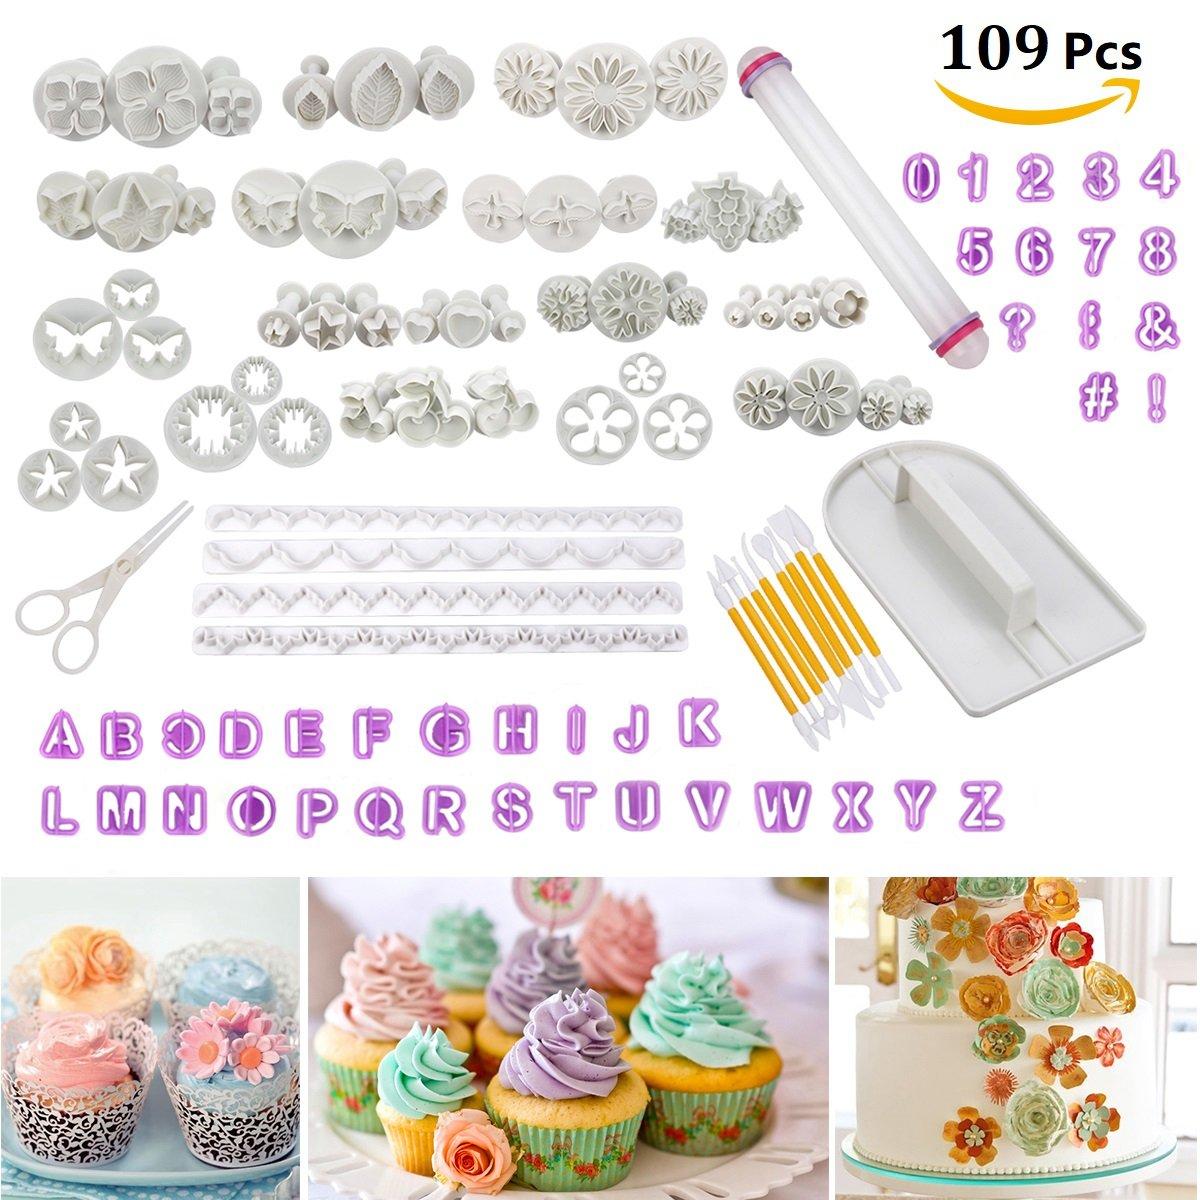 Cadrim Cake Decorating Tools Kit 109 Pcs Fondant Cake Baking Decorating Equipment Non-stick Sugarcraft Icing Cutters Plunger Moulds Accessories Set